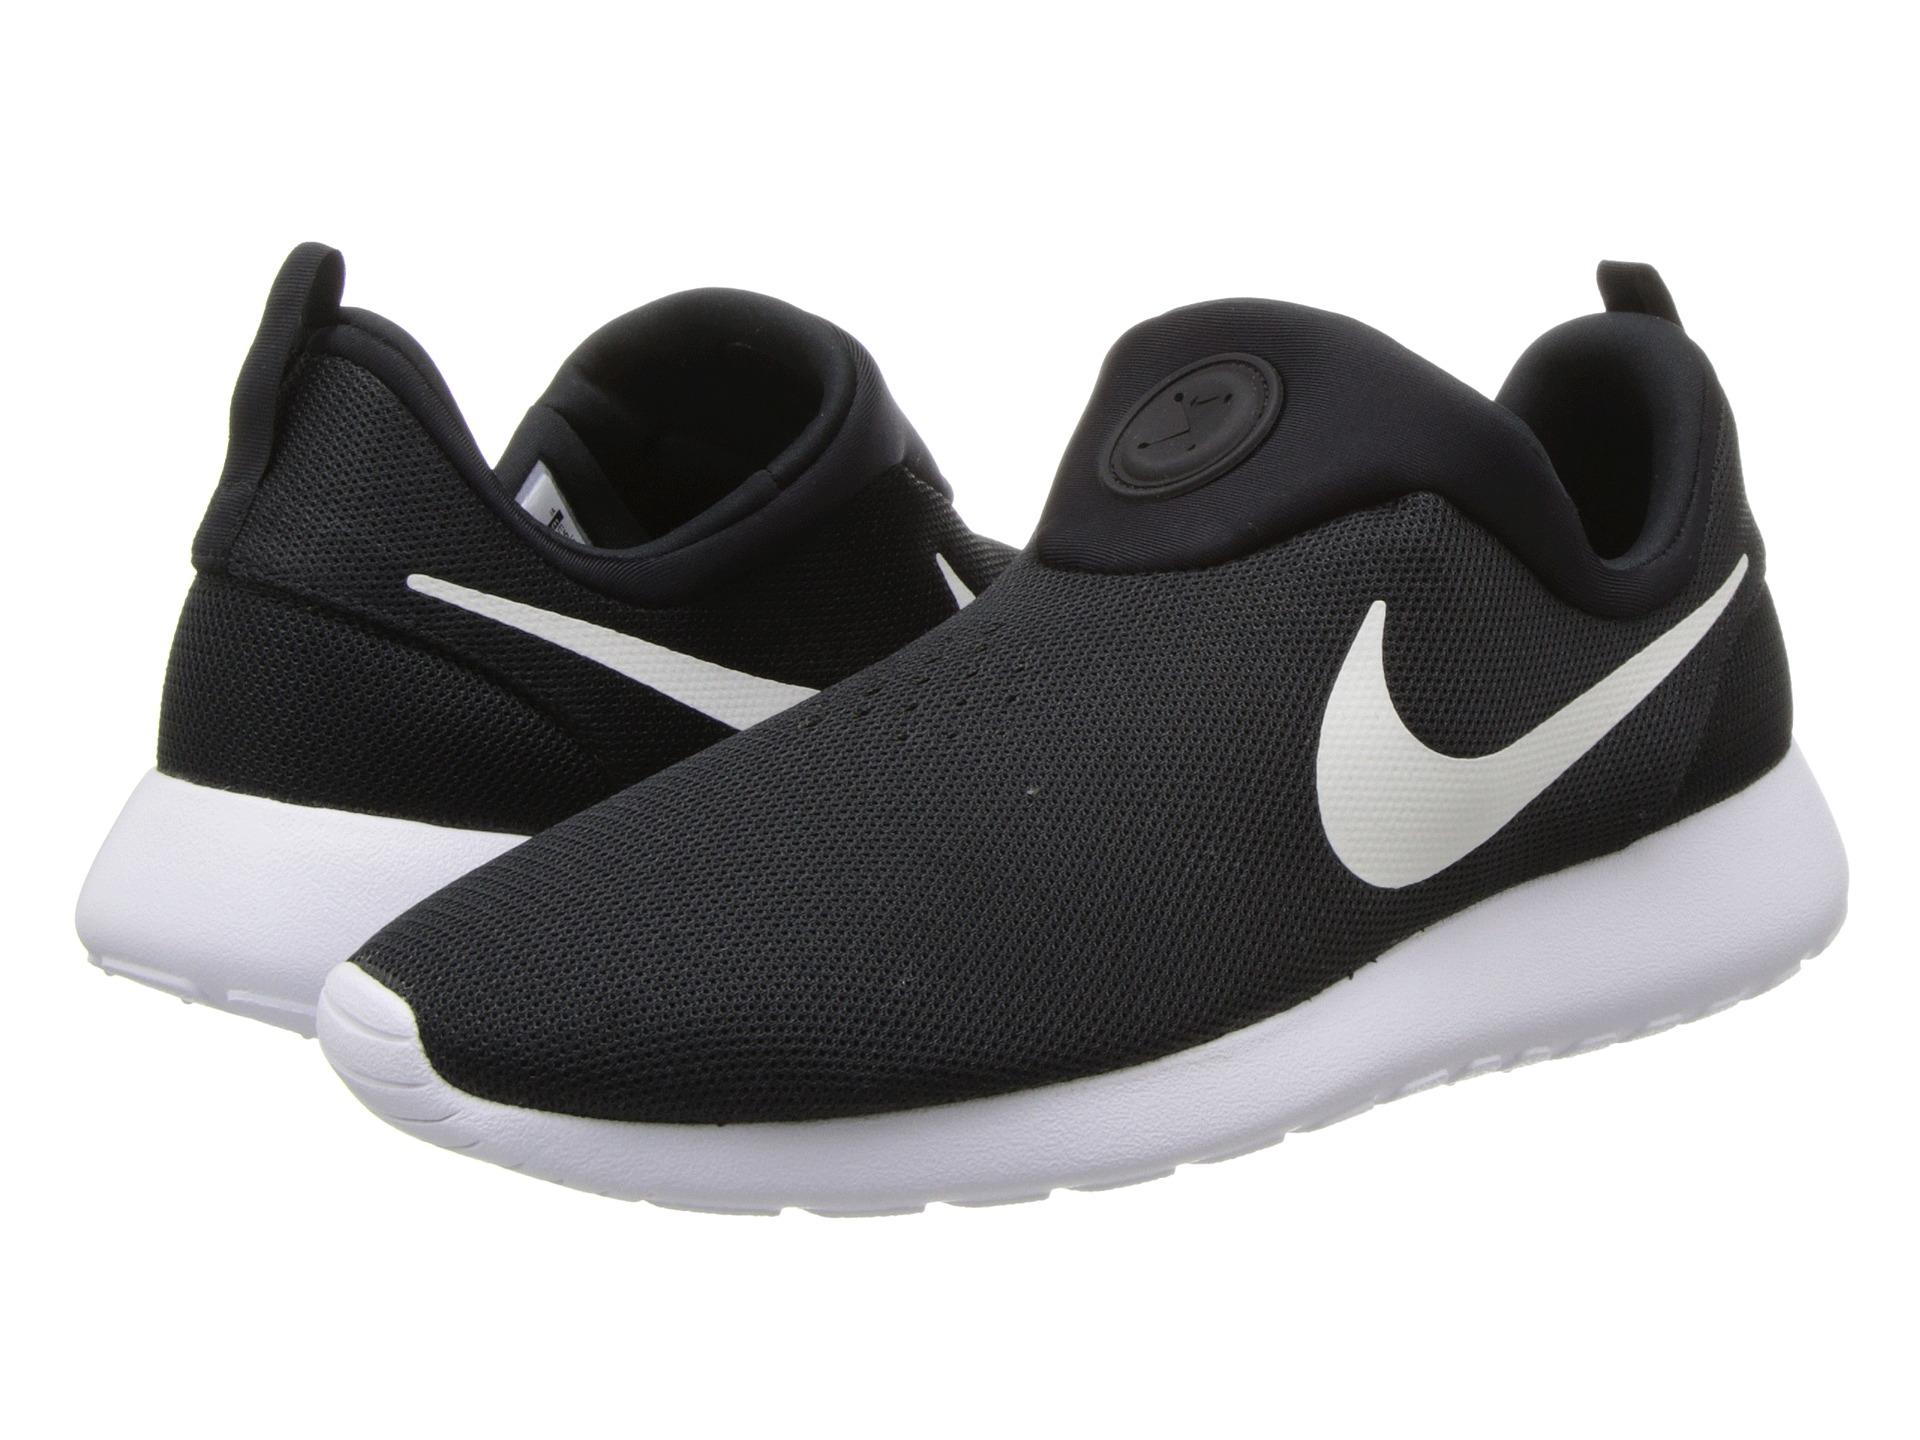 Nike Roshe Run Slip On Shipped Free At Zappos